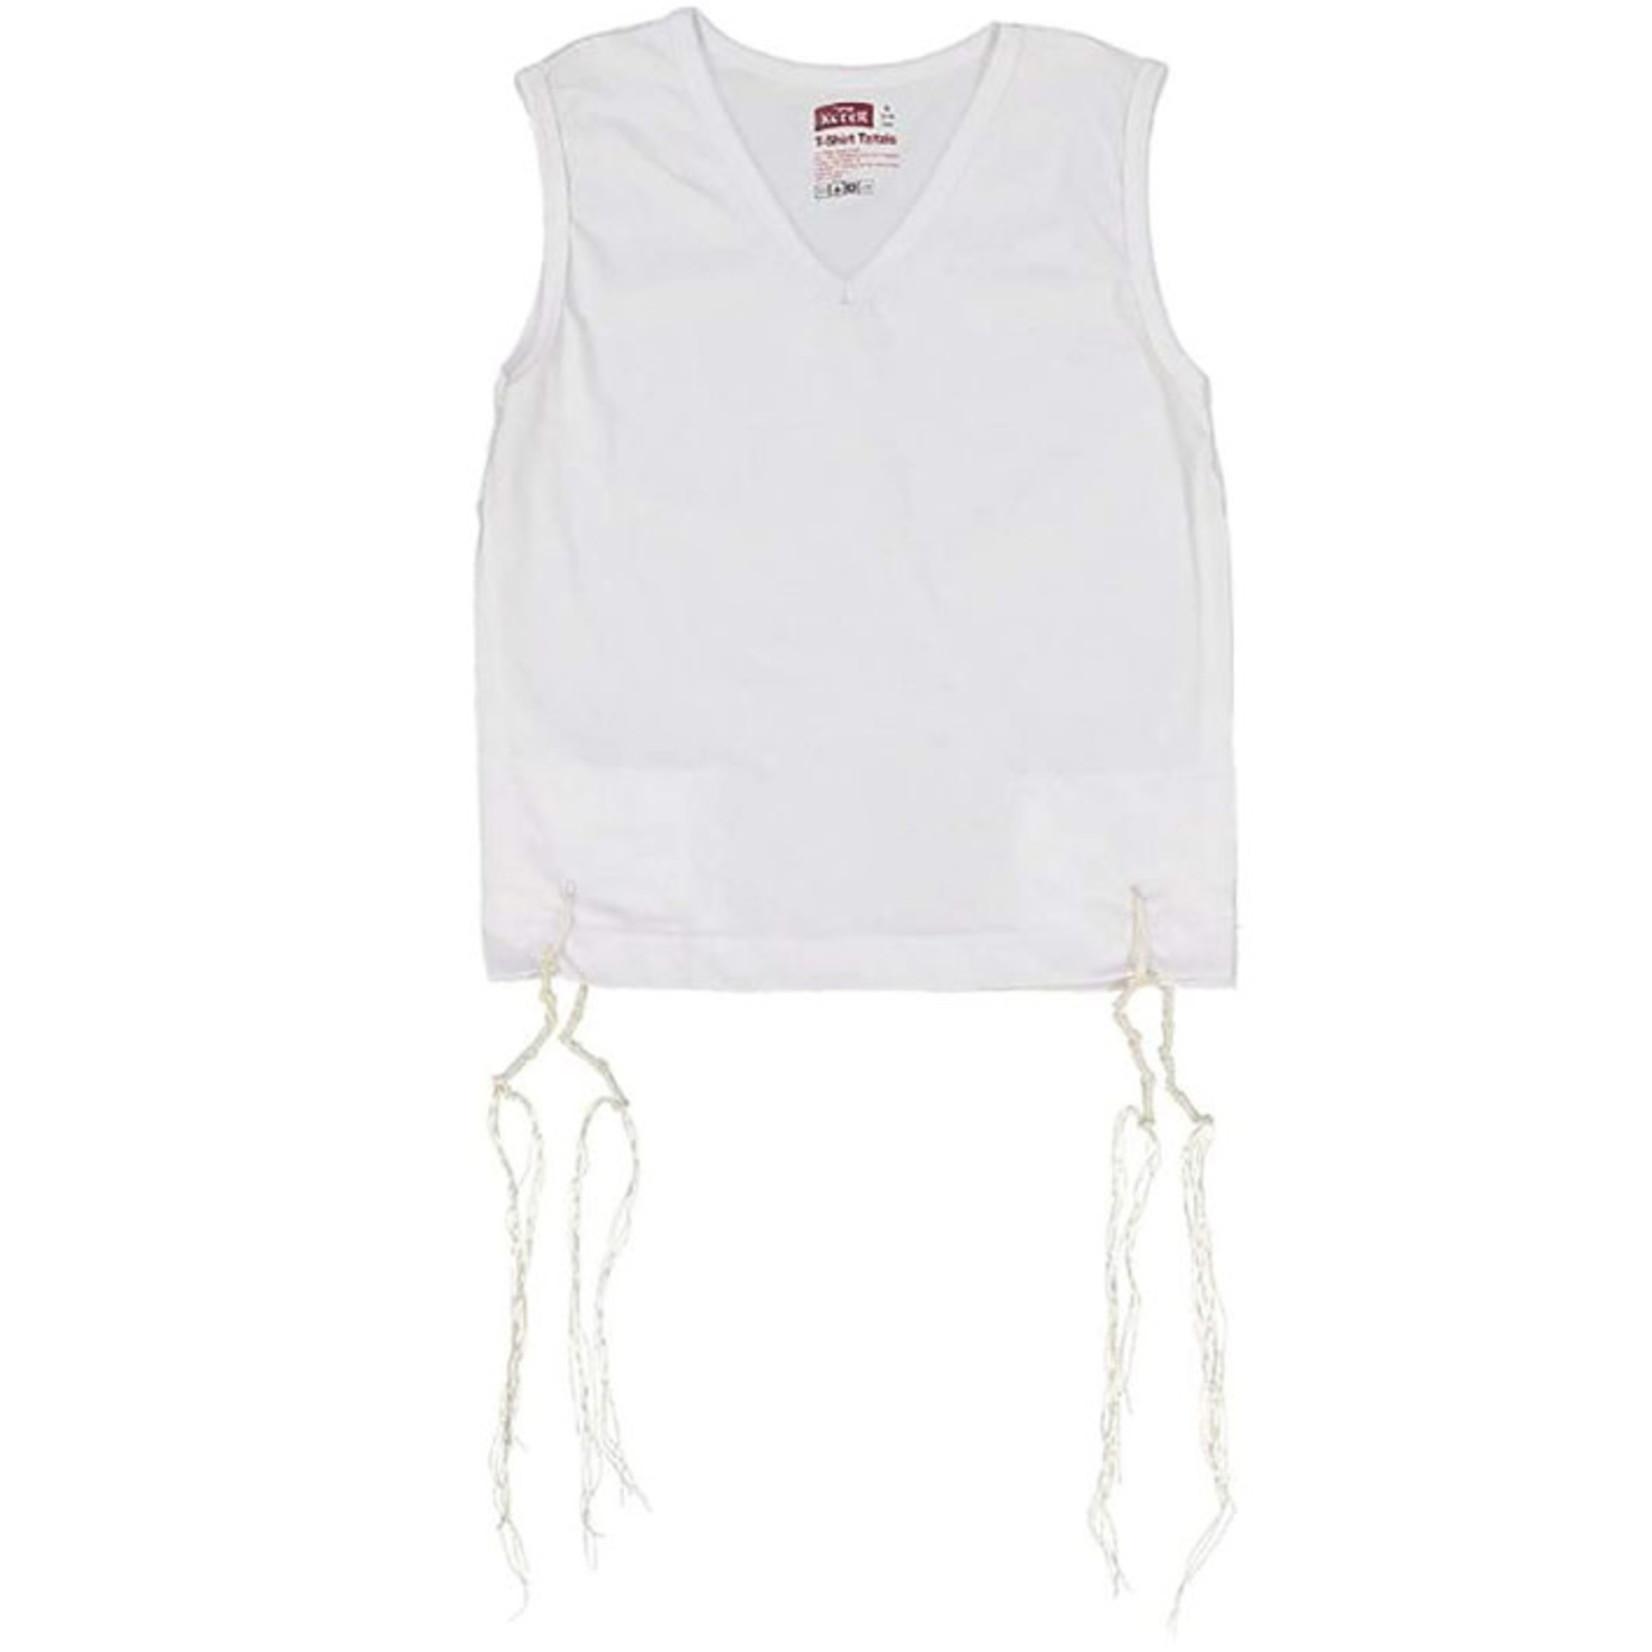 Undershirt-Style Arbah Kanfot, 100% Cotton, V-Neck, Size 5